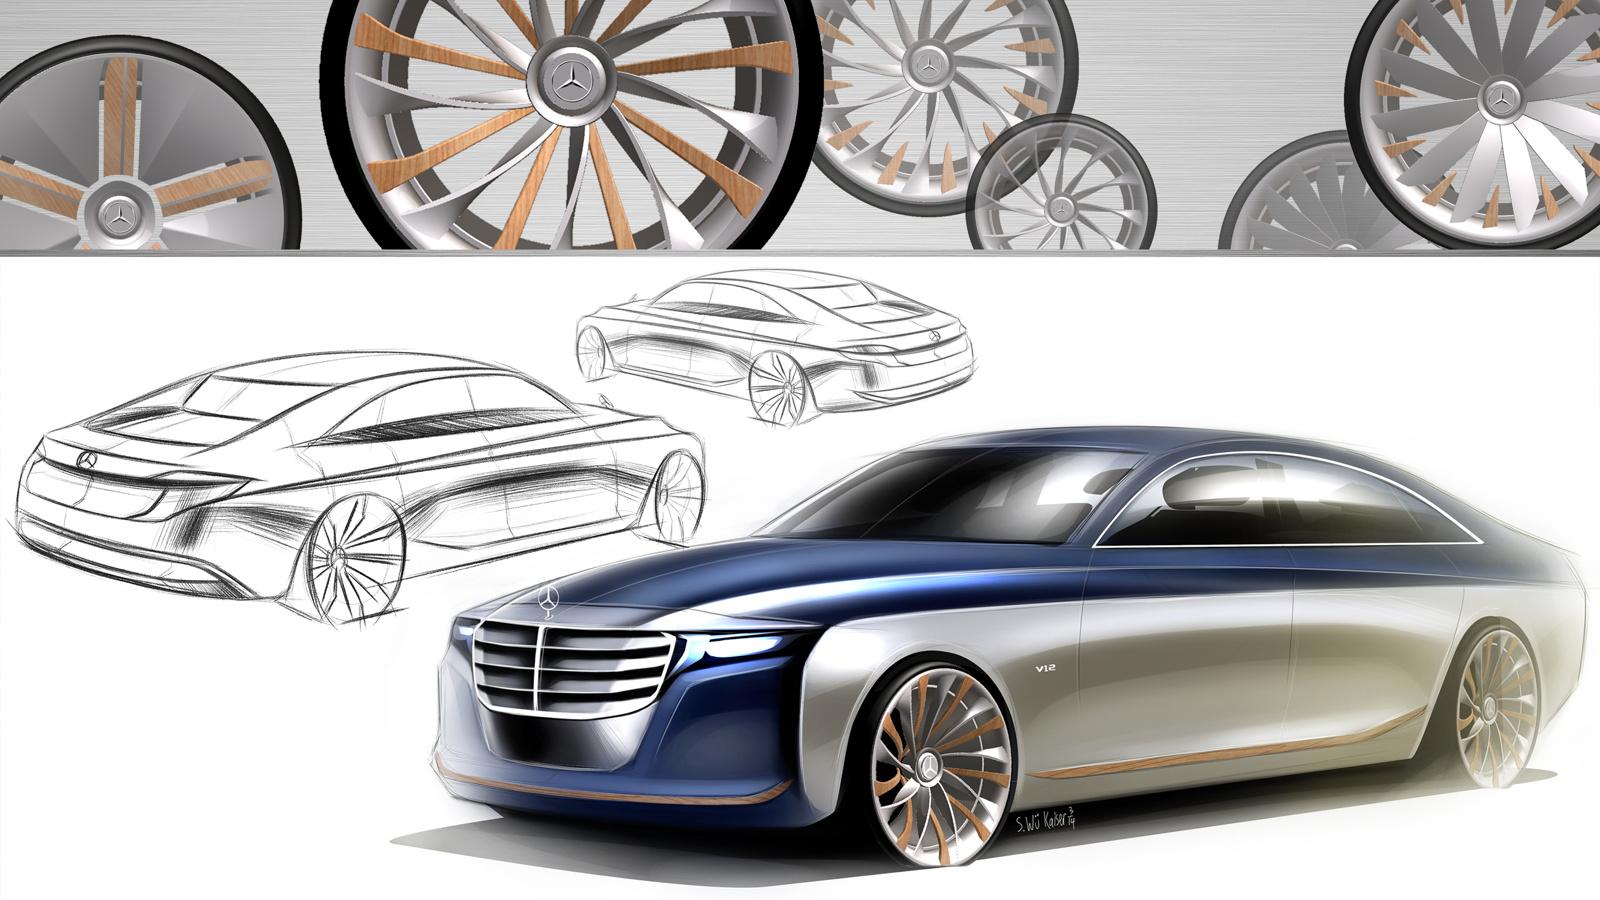 2021 mercedes benz u class concept proposed by a design student a mercedes. Black Bedroom Furniture Sets. Home Design Ideas